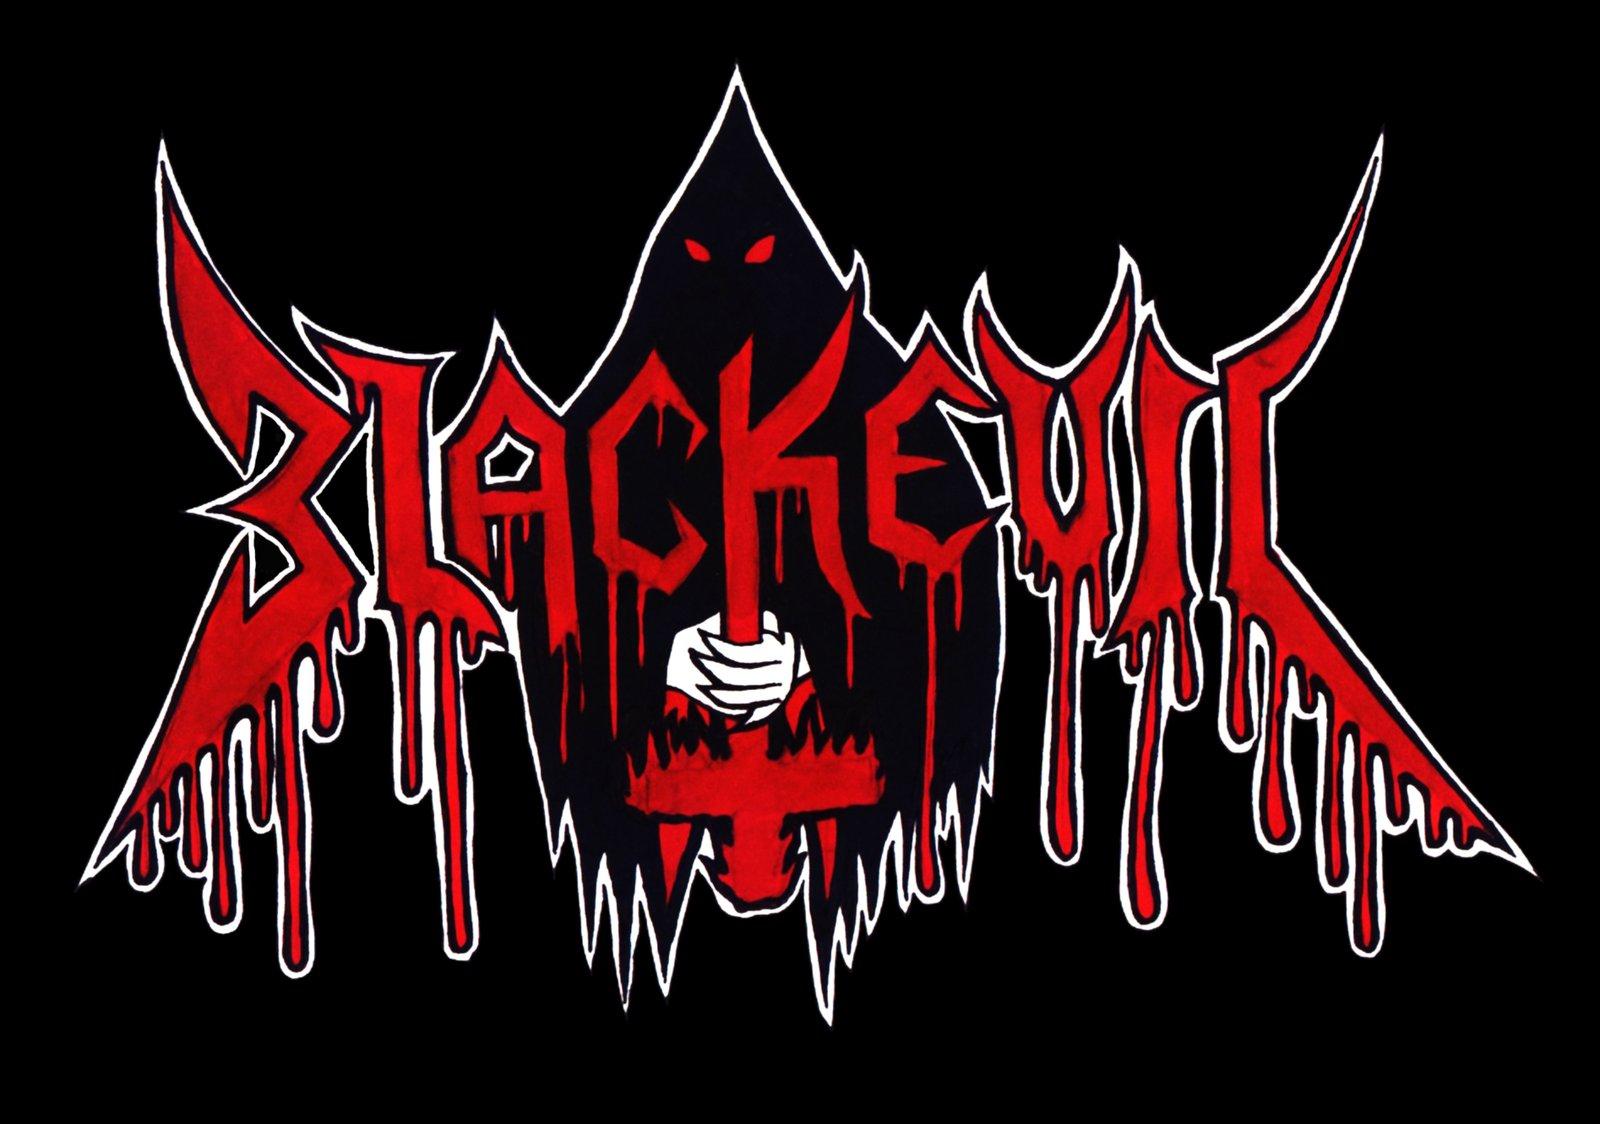 Blackevil